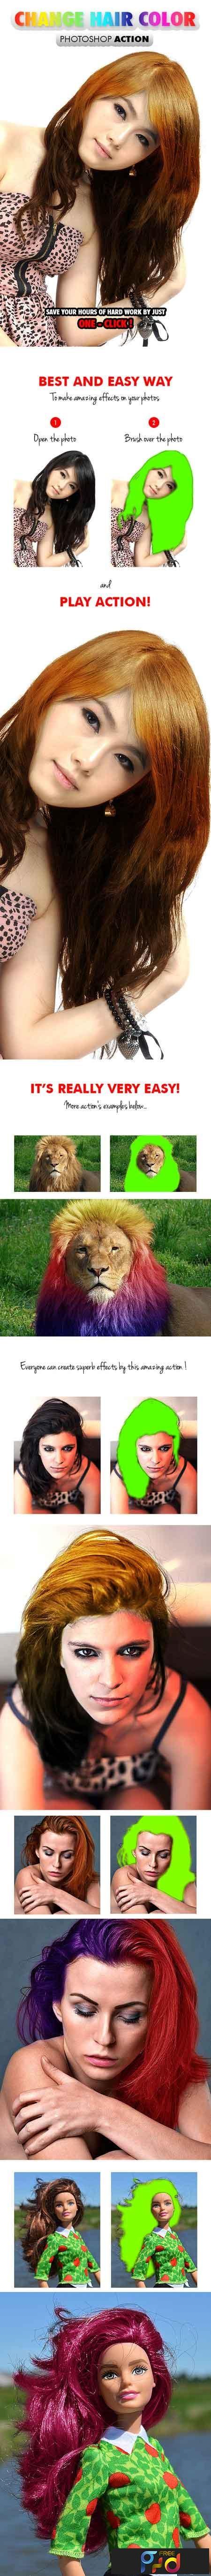 Change Hair Color - Photoshop Action 17682735 1